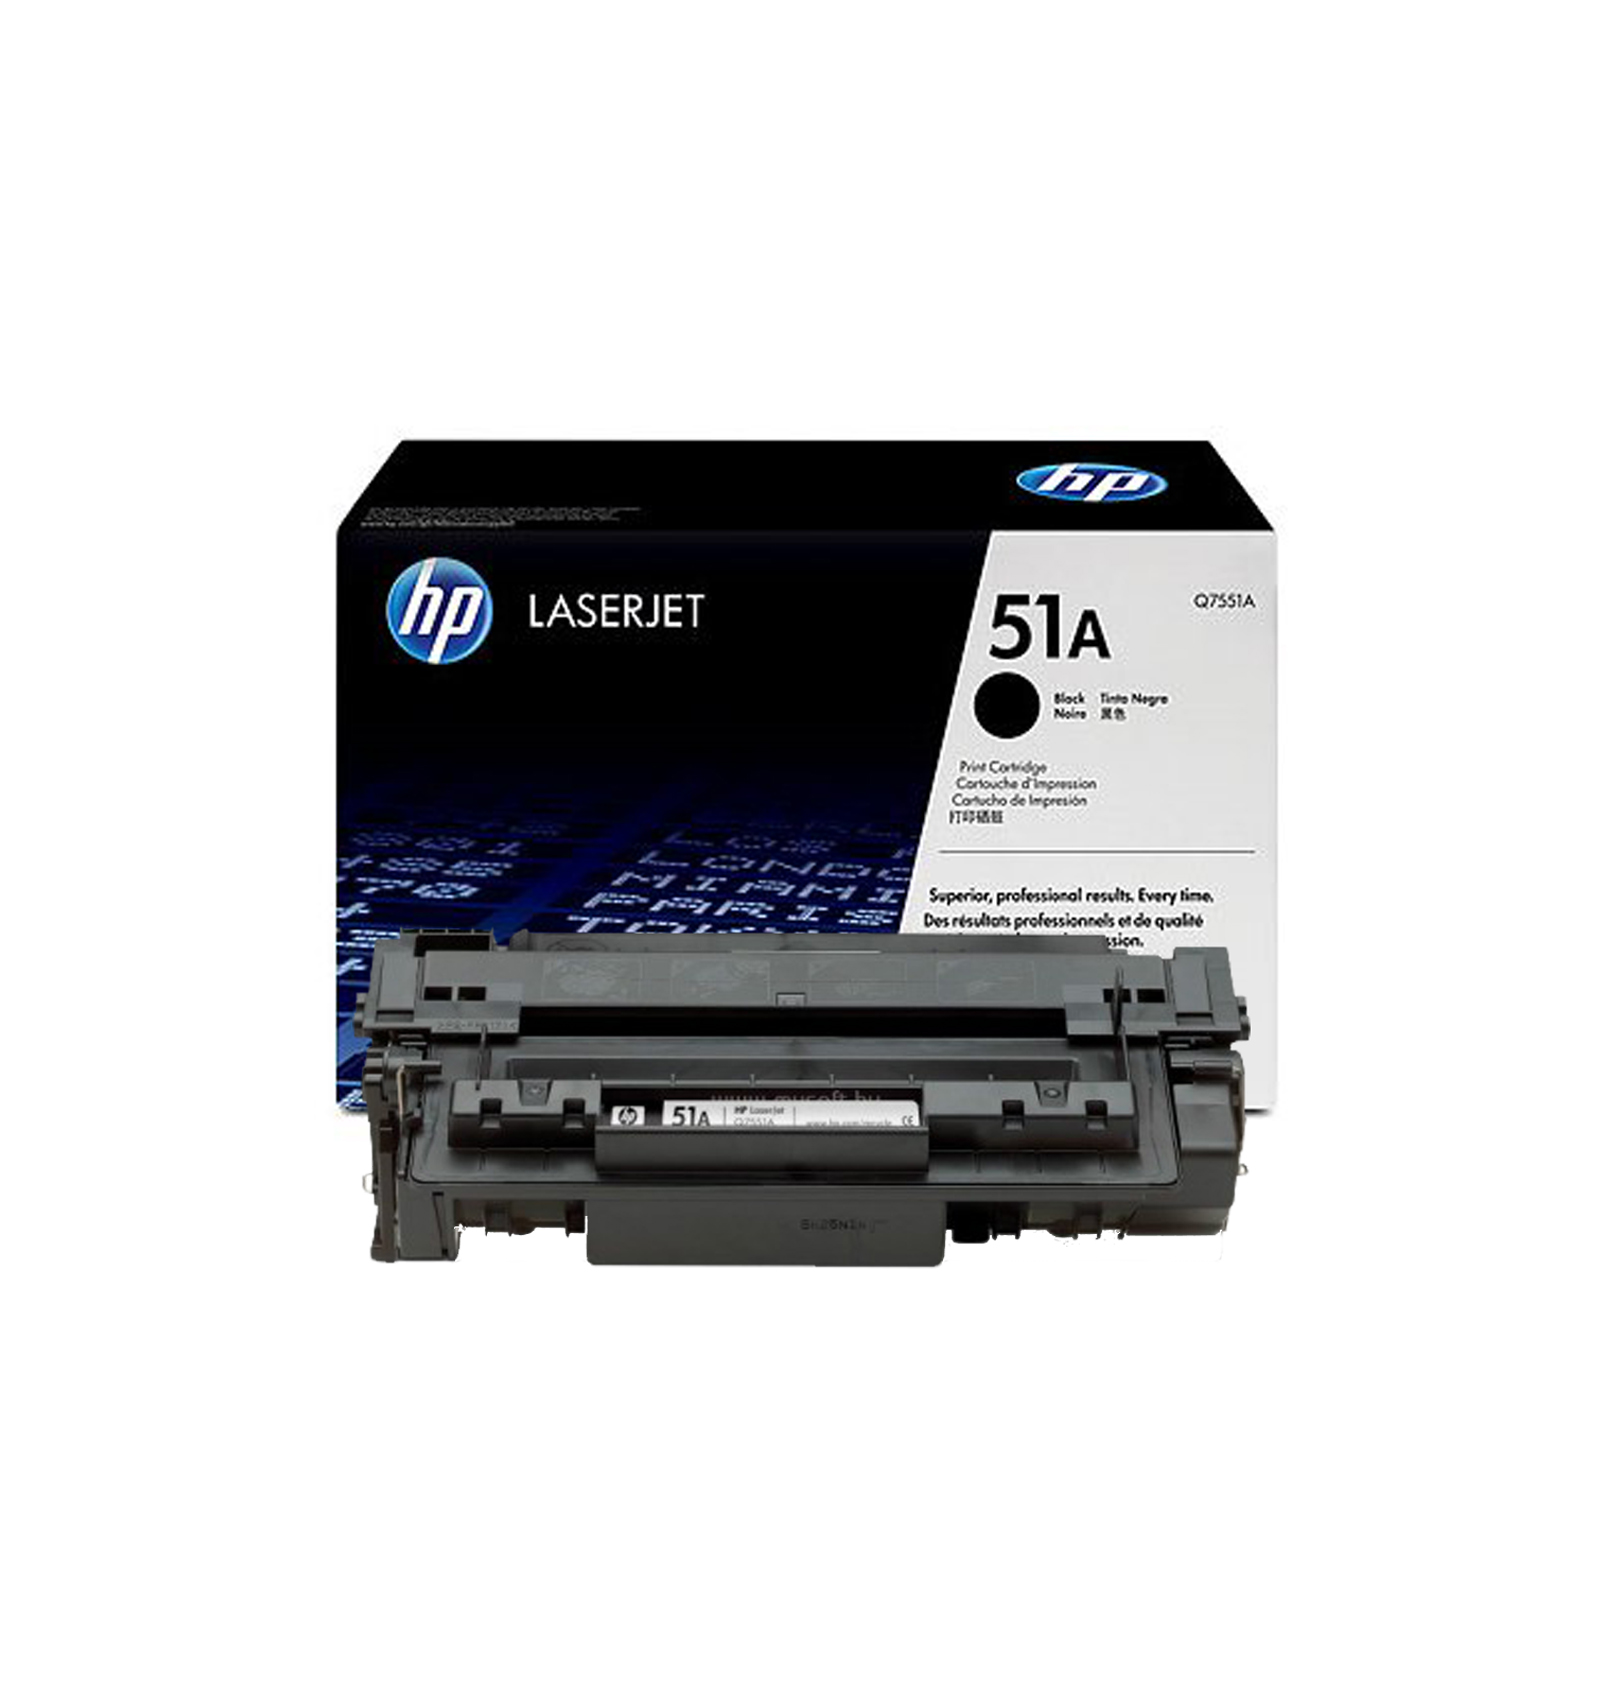 HP Q7551A (51A) для LaserJet P3005/M3027mfp/M3035mfp